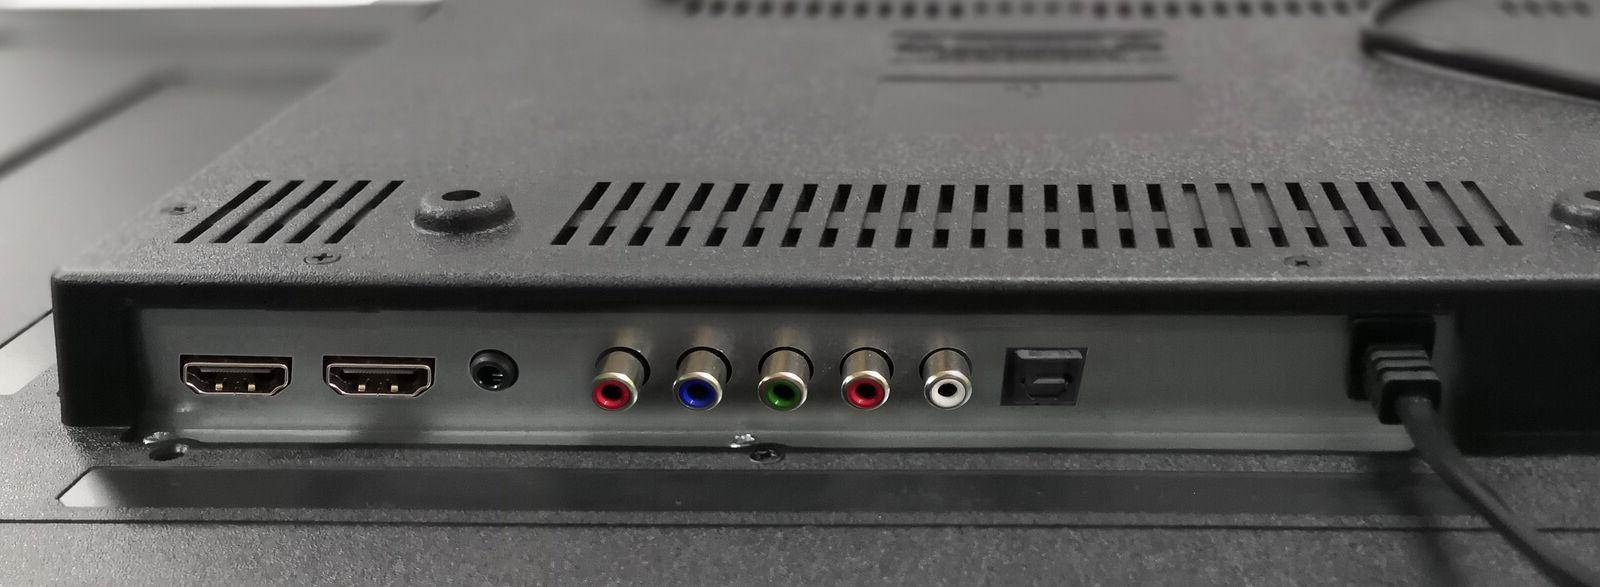 RCA LED Ultra HD 2160P RTU6050 2-Day NoTax